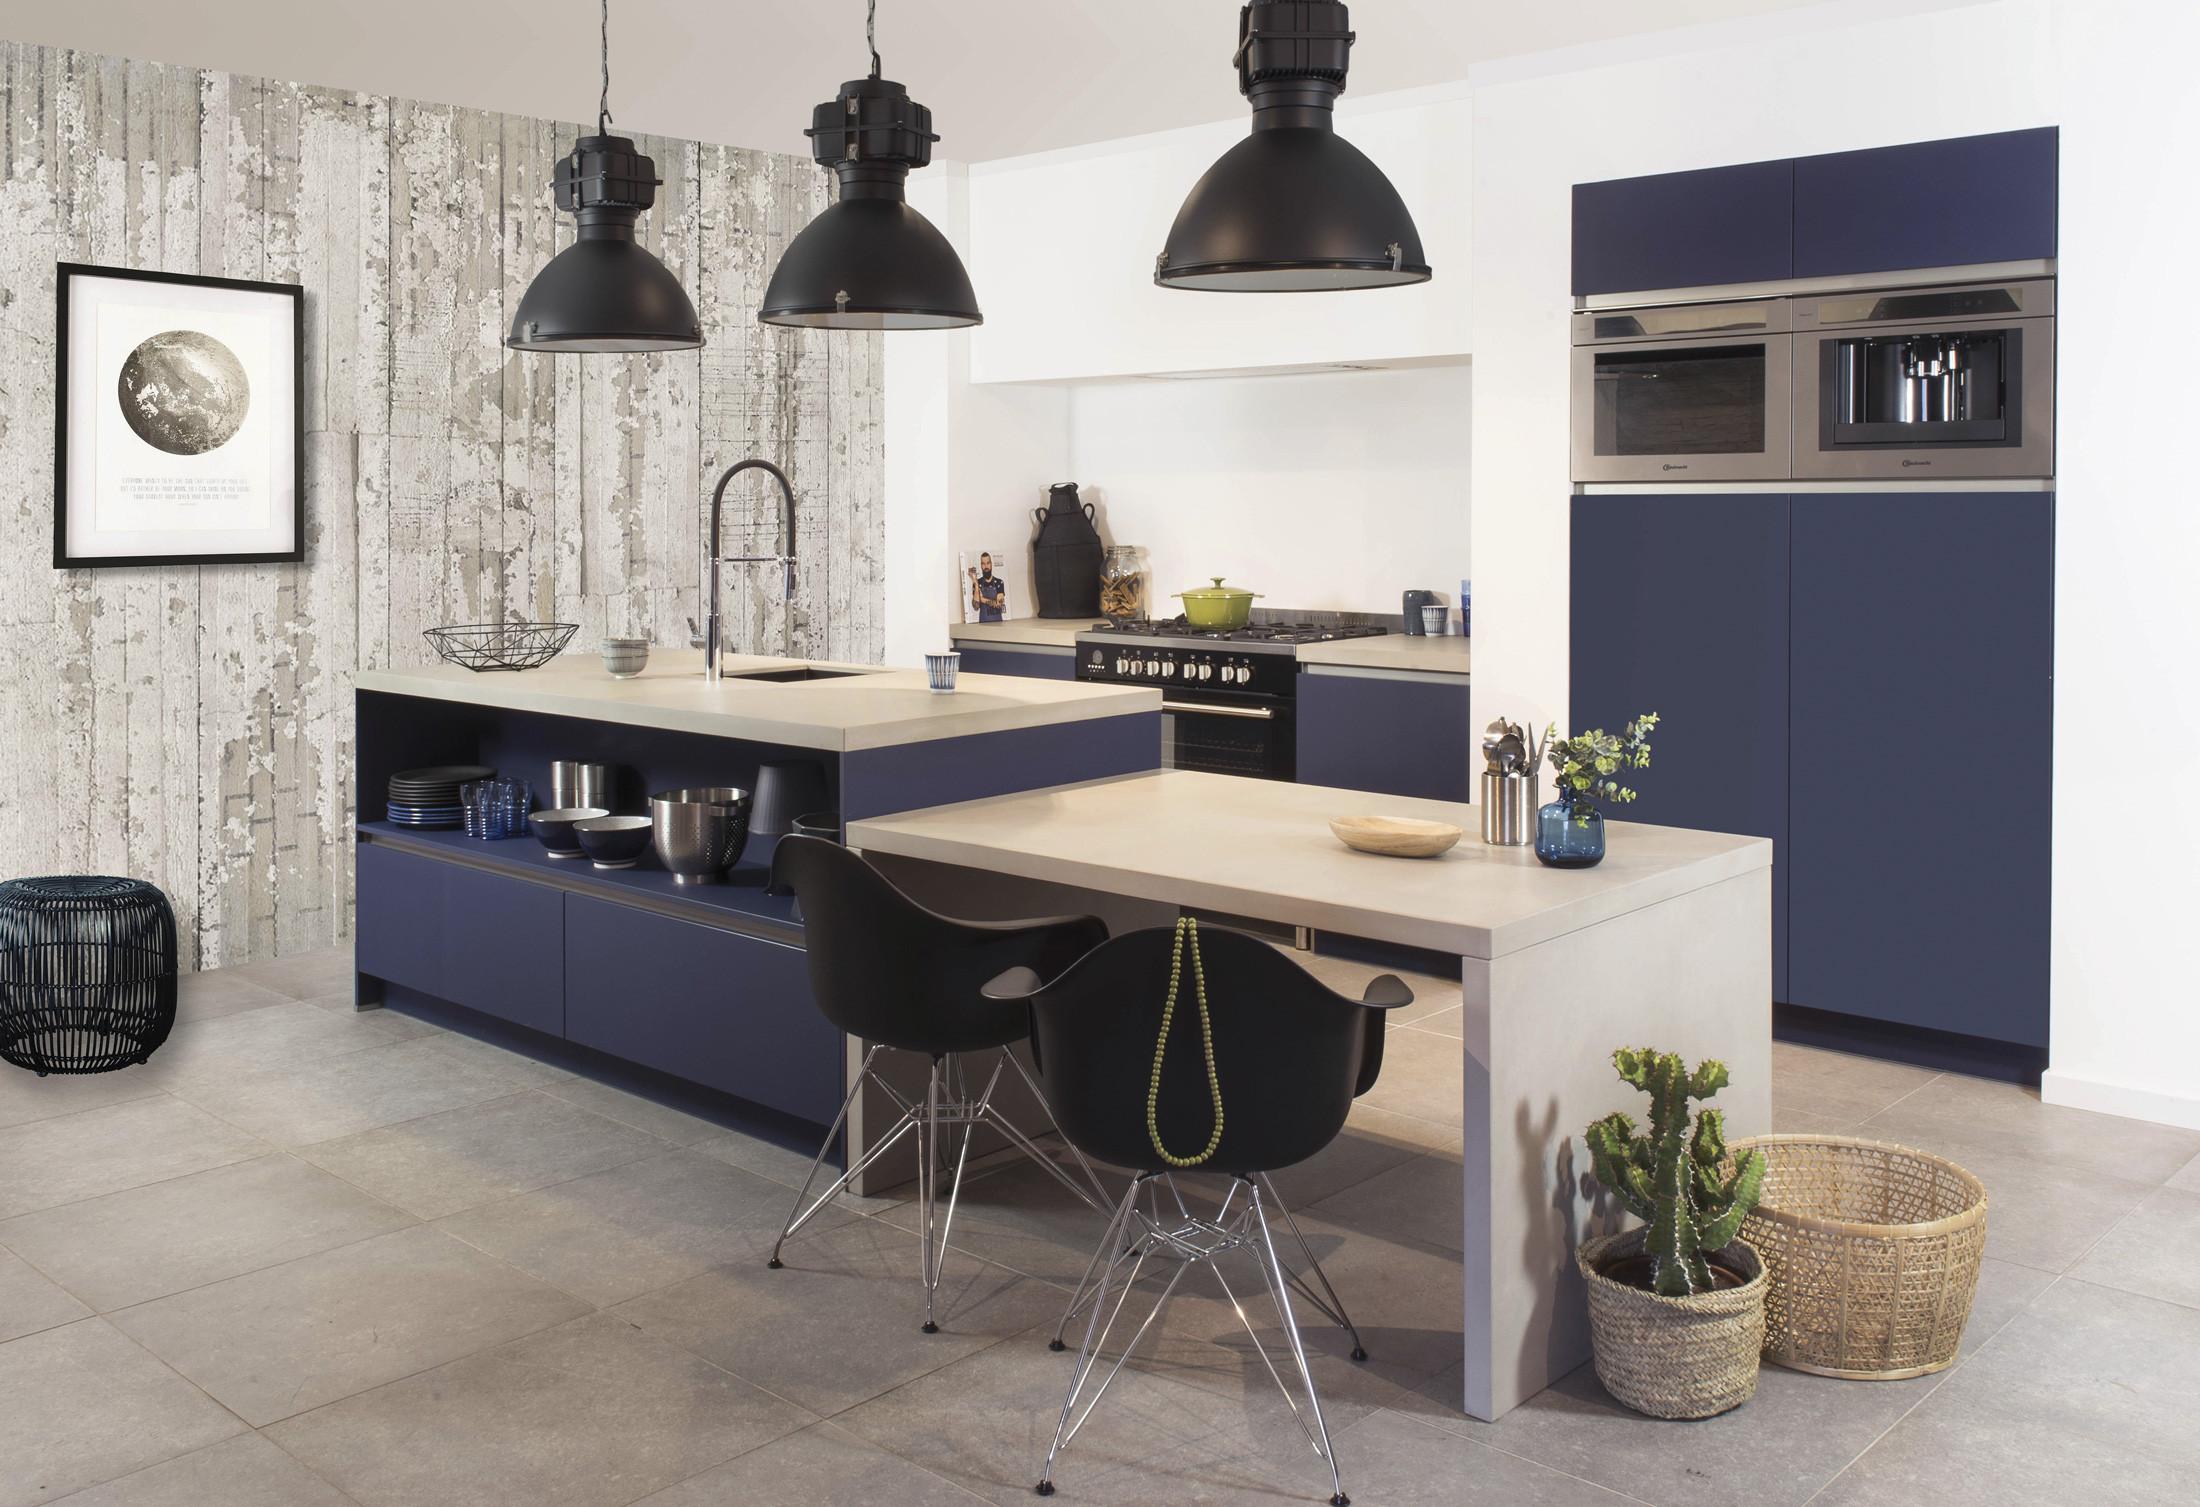 Keuken-blauw-Grando-keukens-Utrecht.jpg